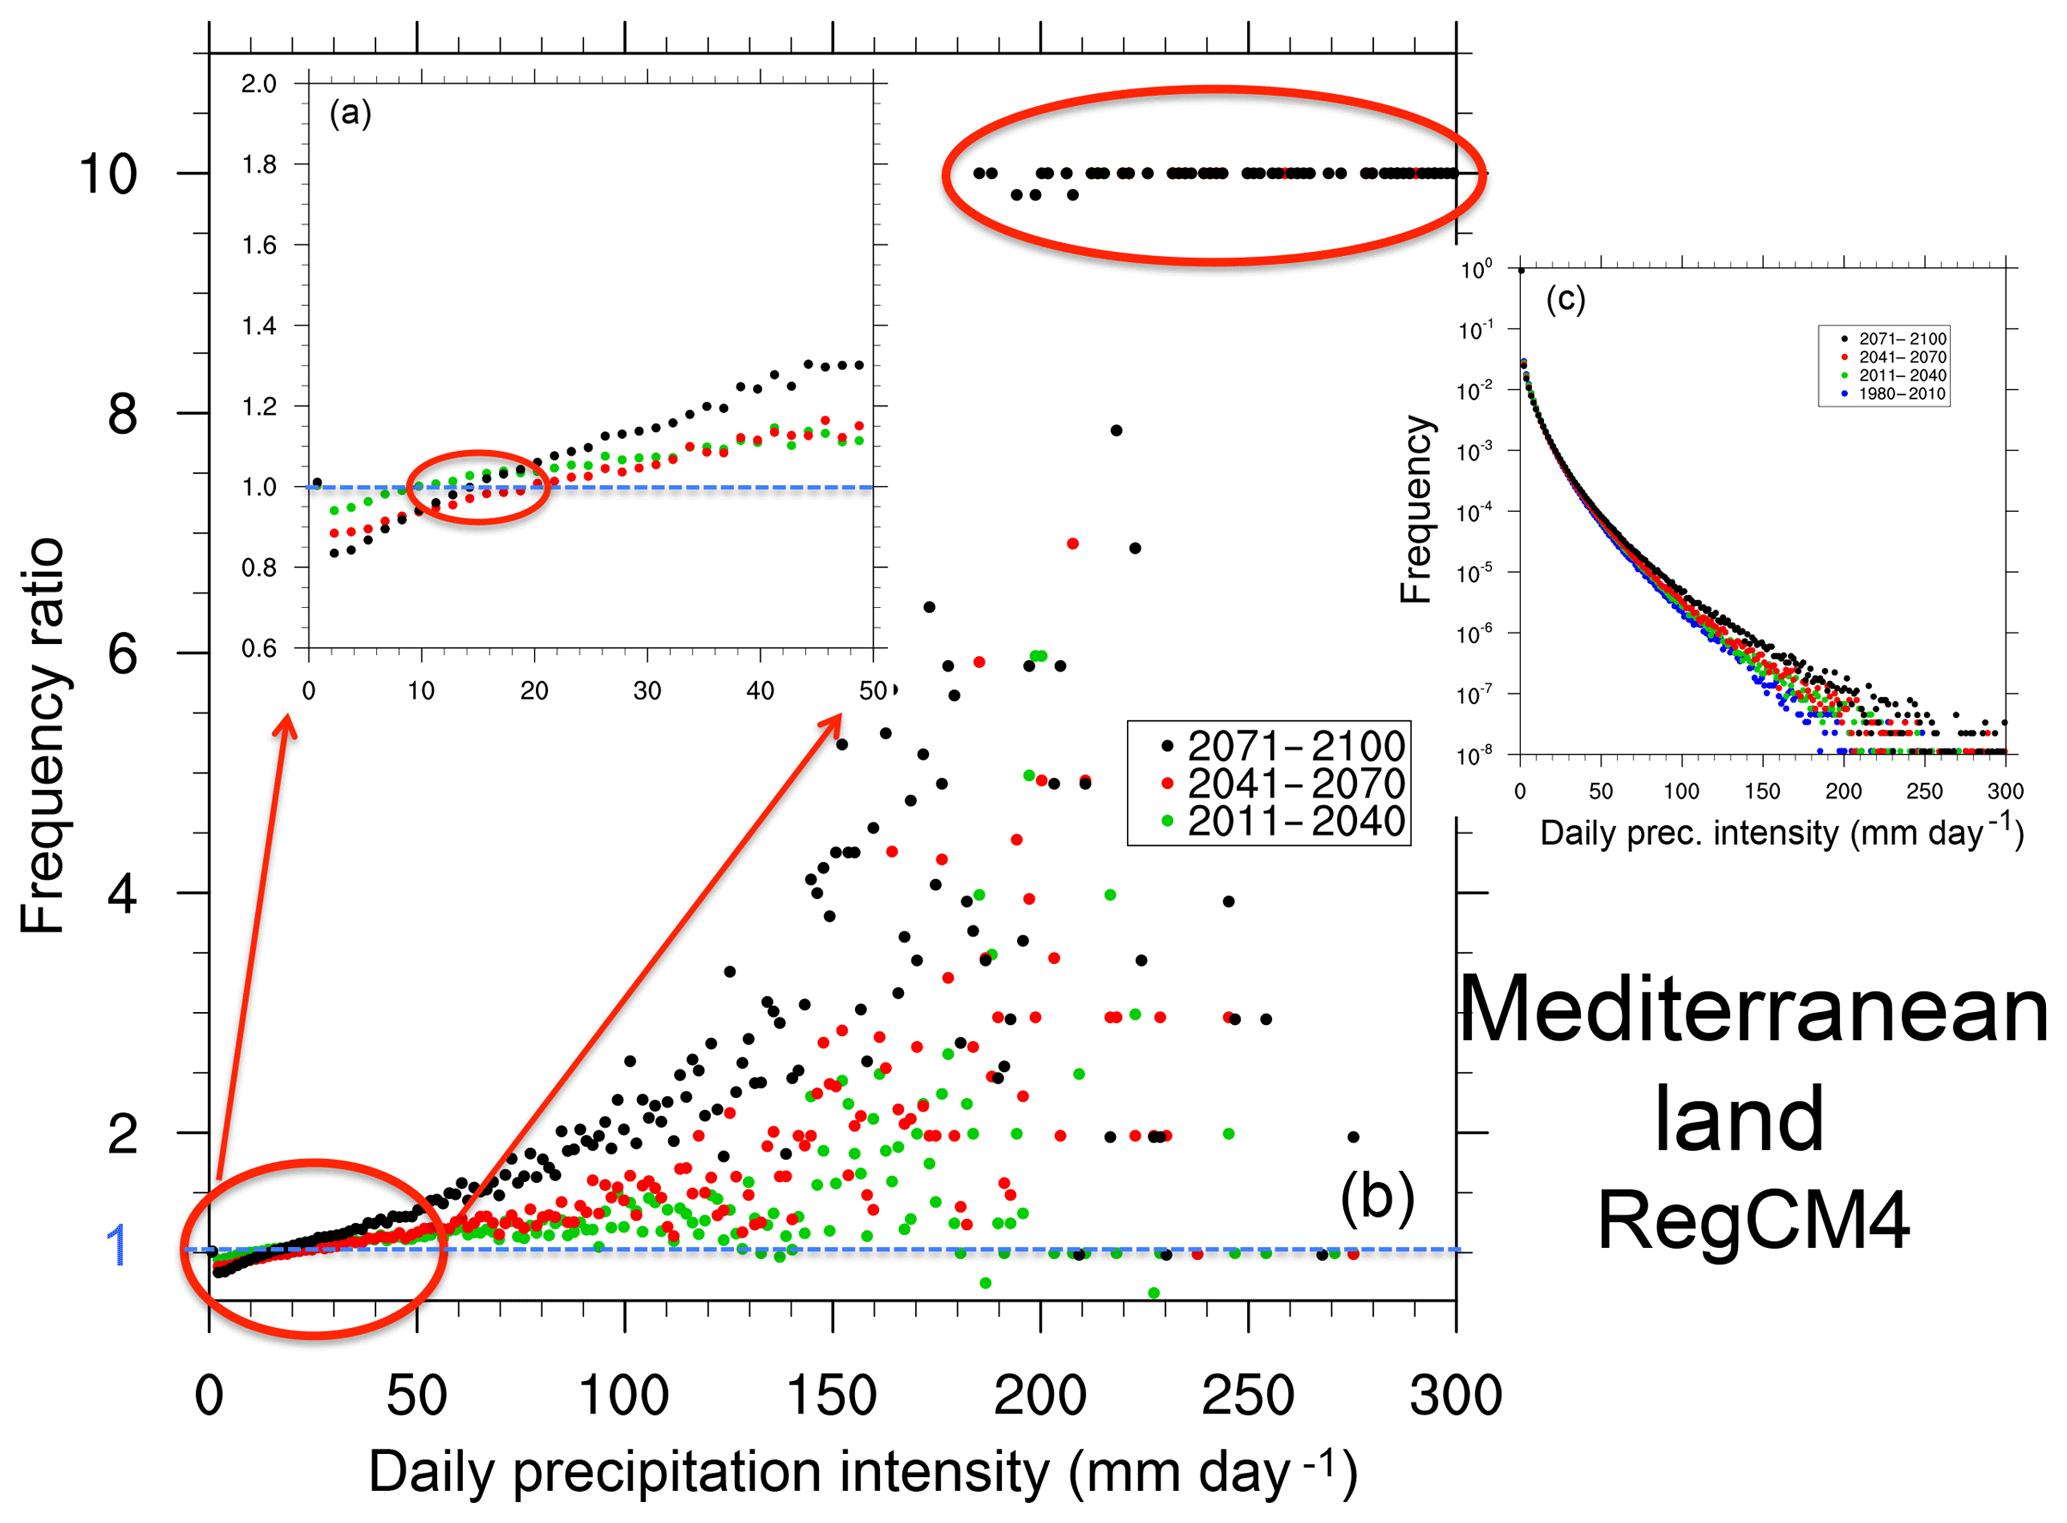 ESD - The response of precipitation characteristics to global